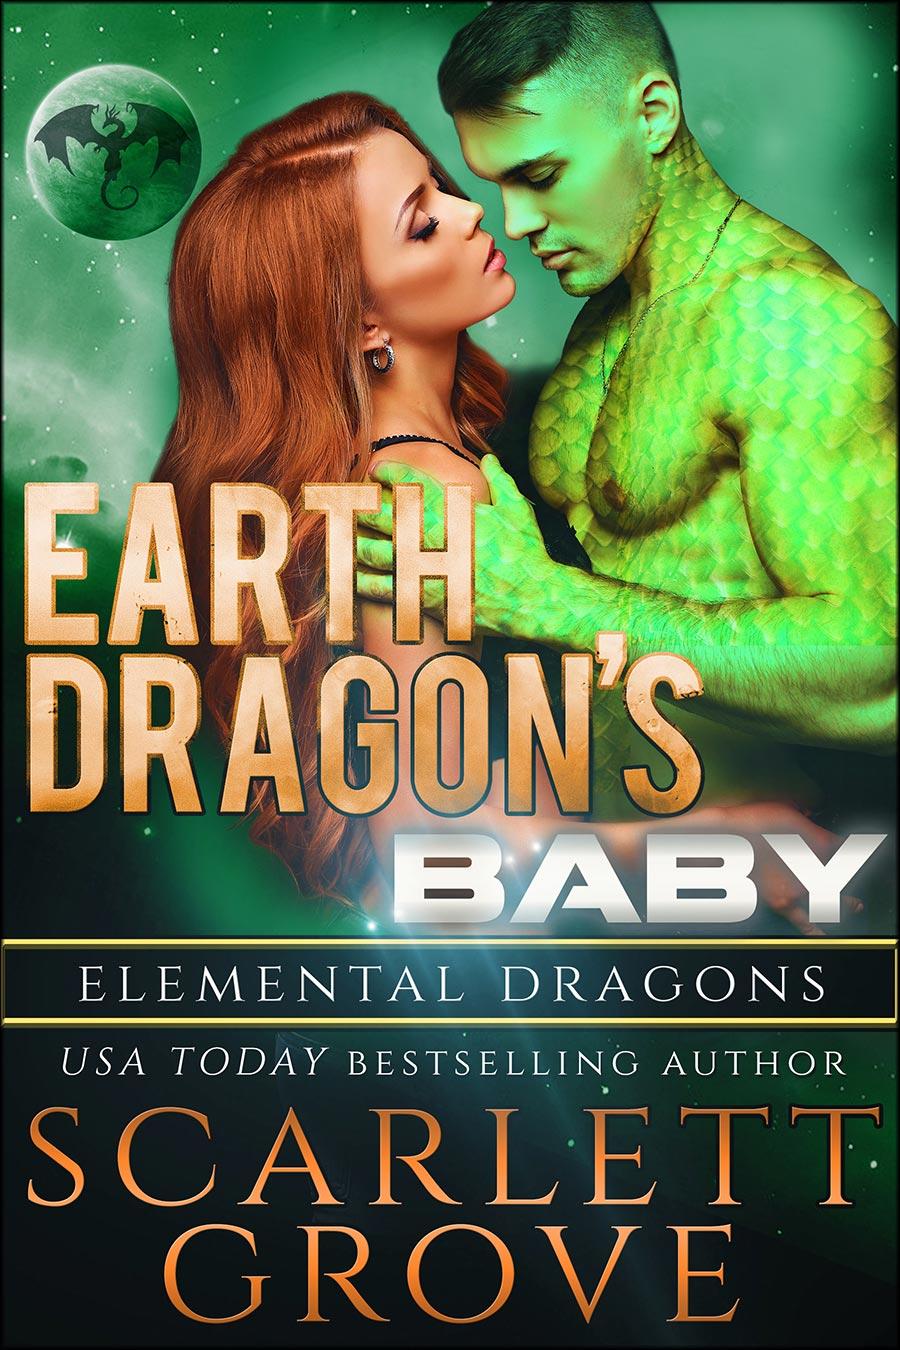 Scarlet-Grove---Alien-Dragon-Princes---Earth-Dragons-Baby.jpg